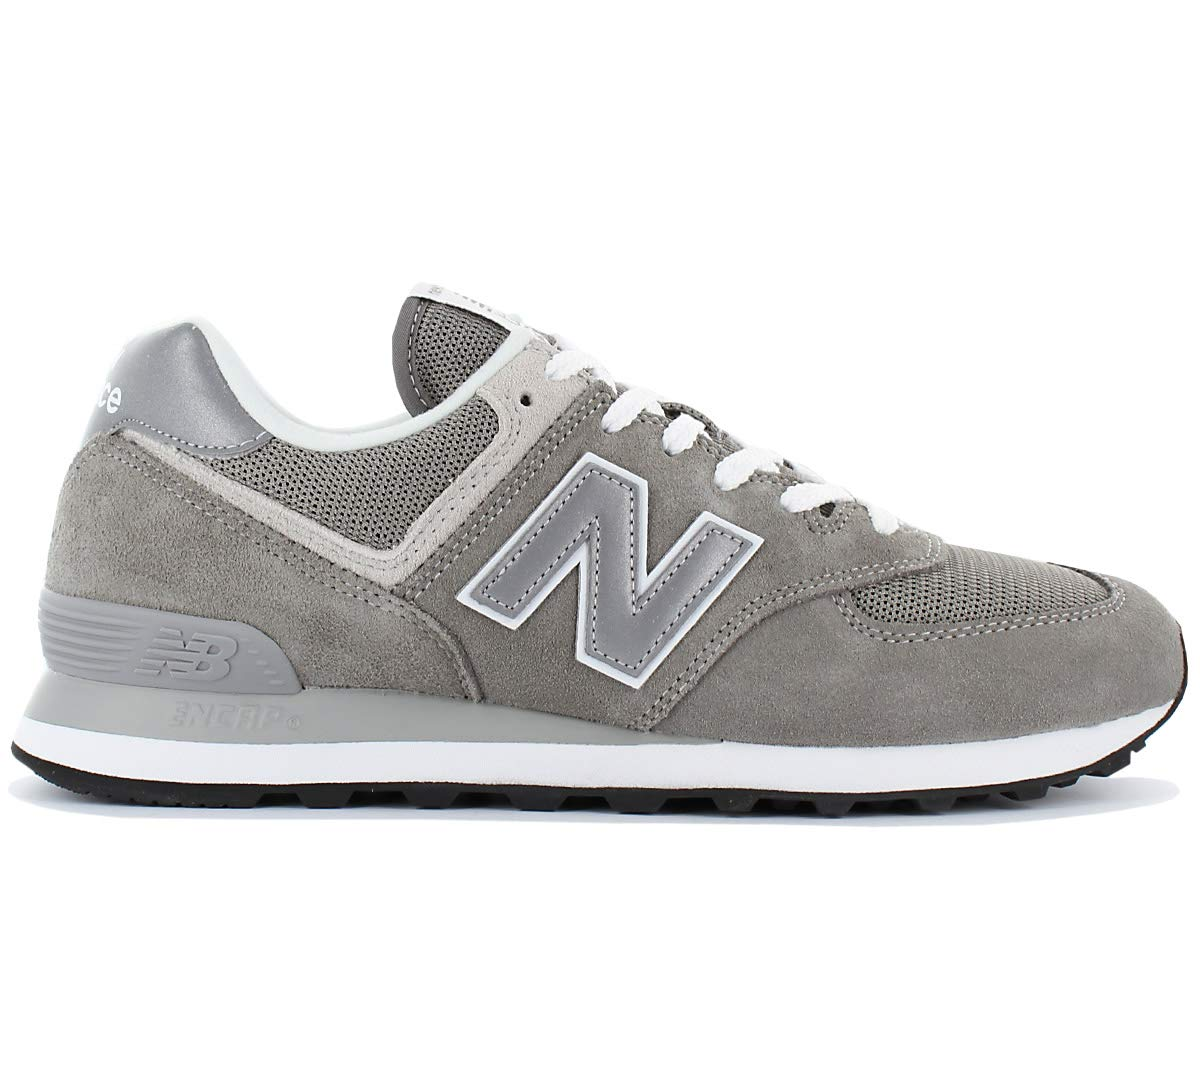 New Balance Mens 574 Sneaker,Grey, 8 D(M) US